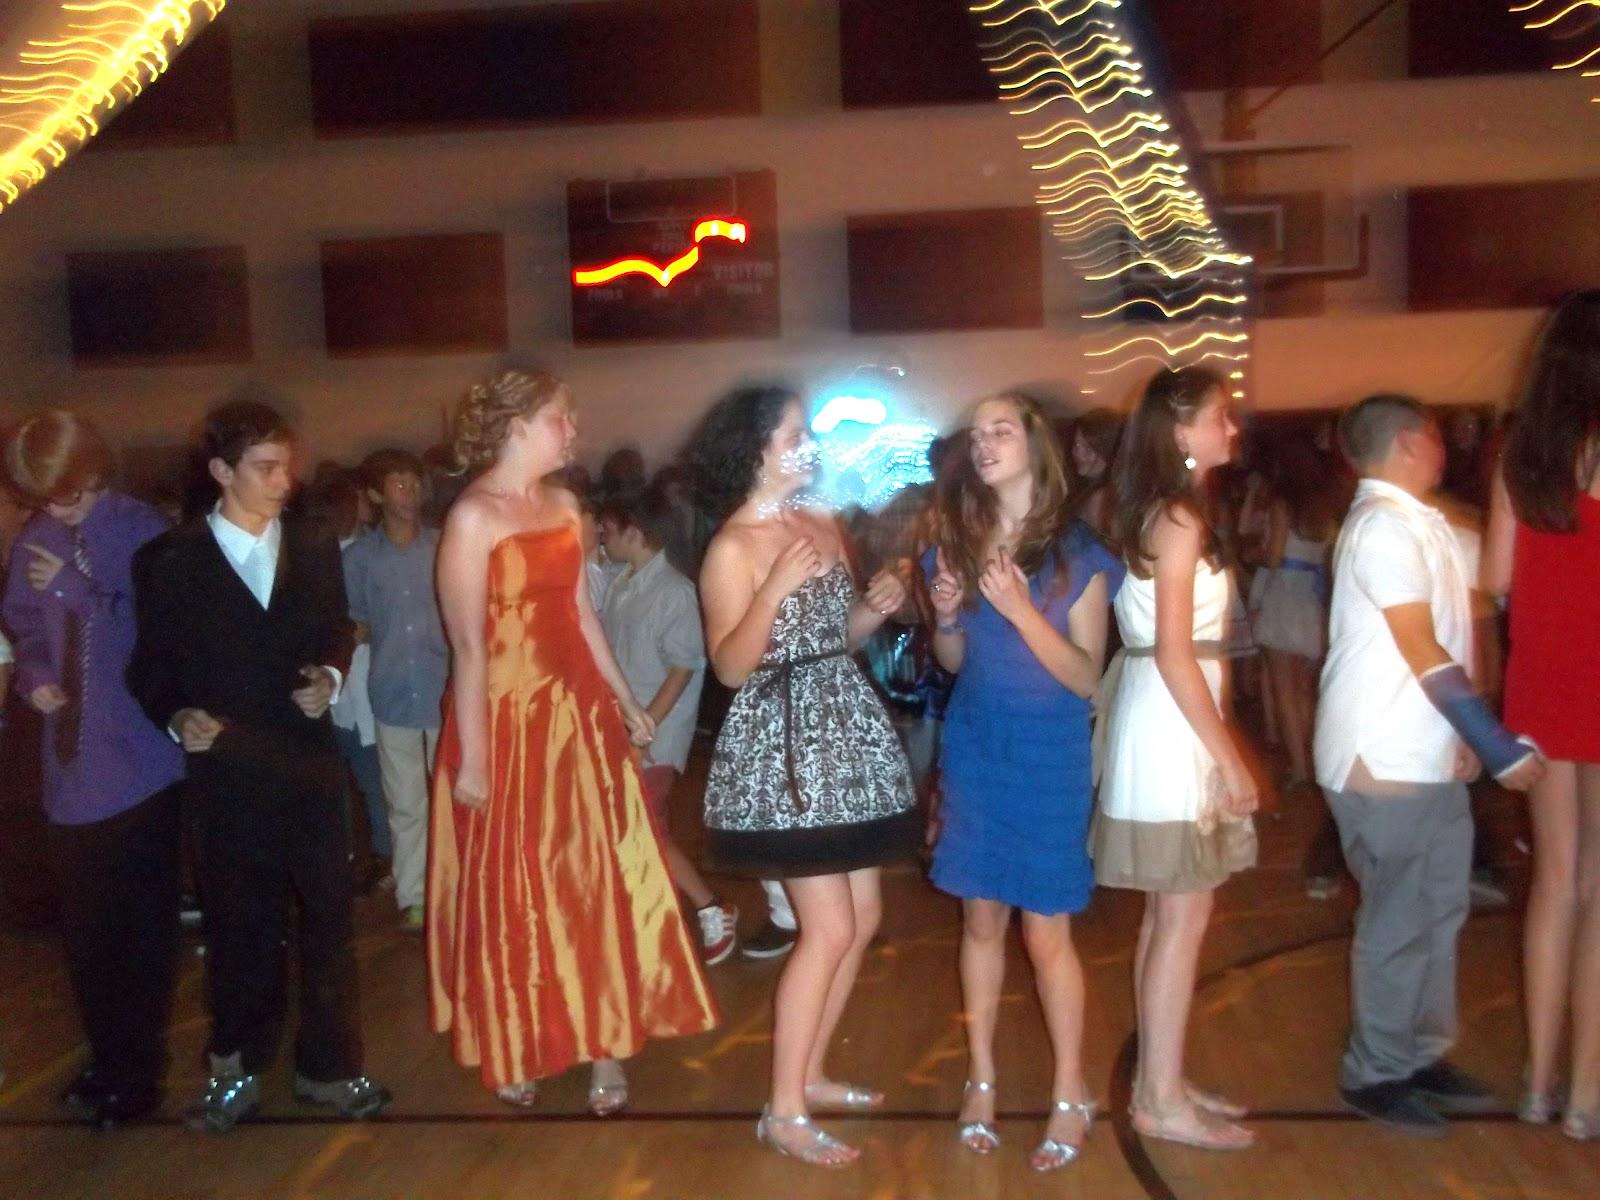 Monument valley regional middle school art class semi formal dance